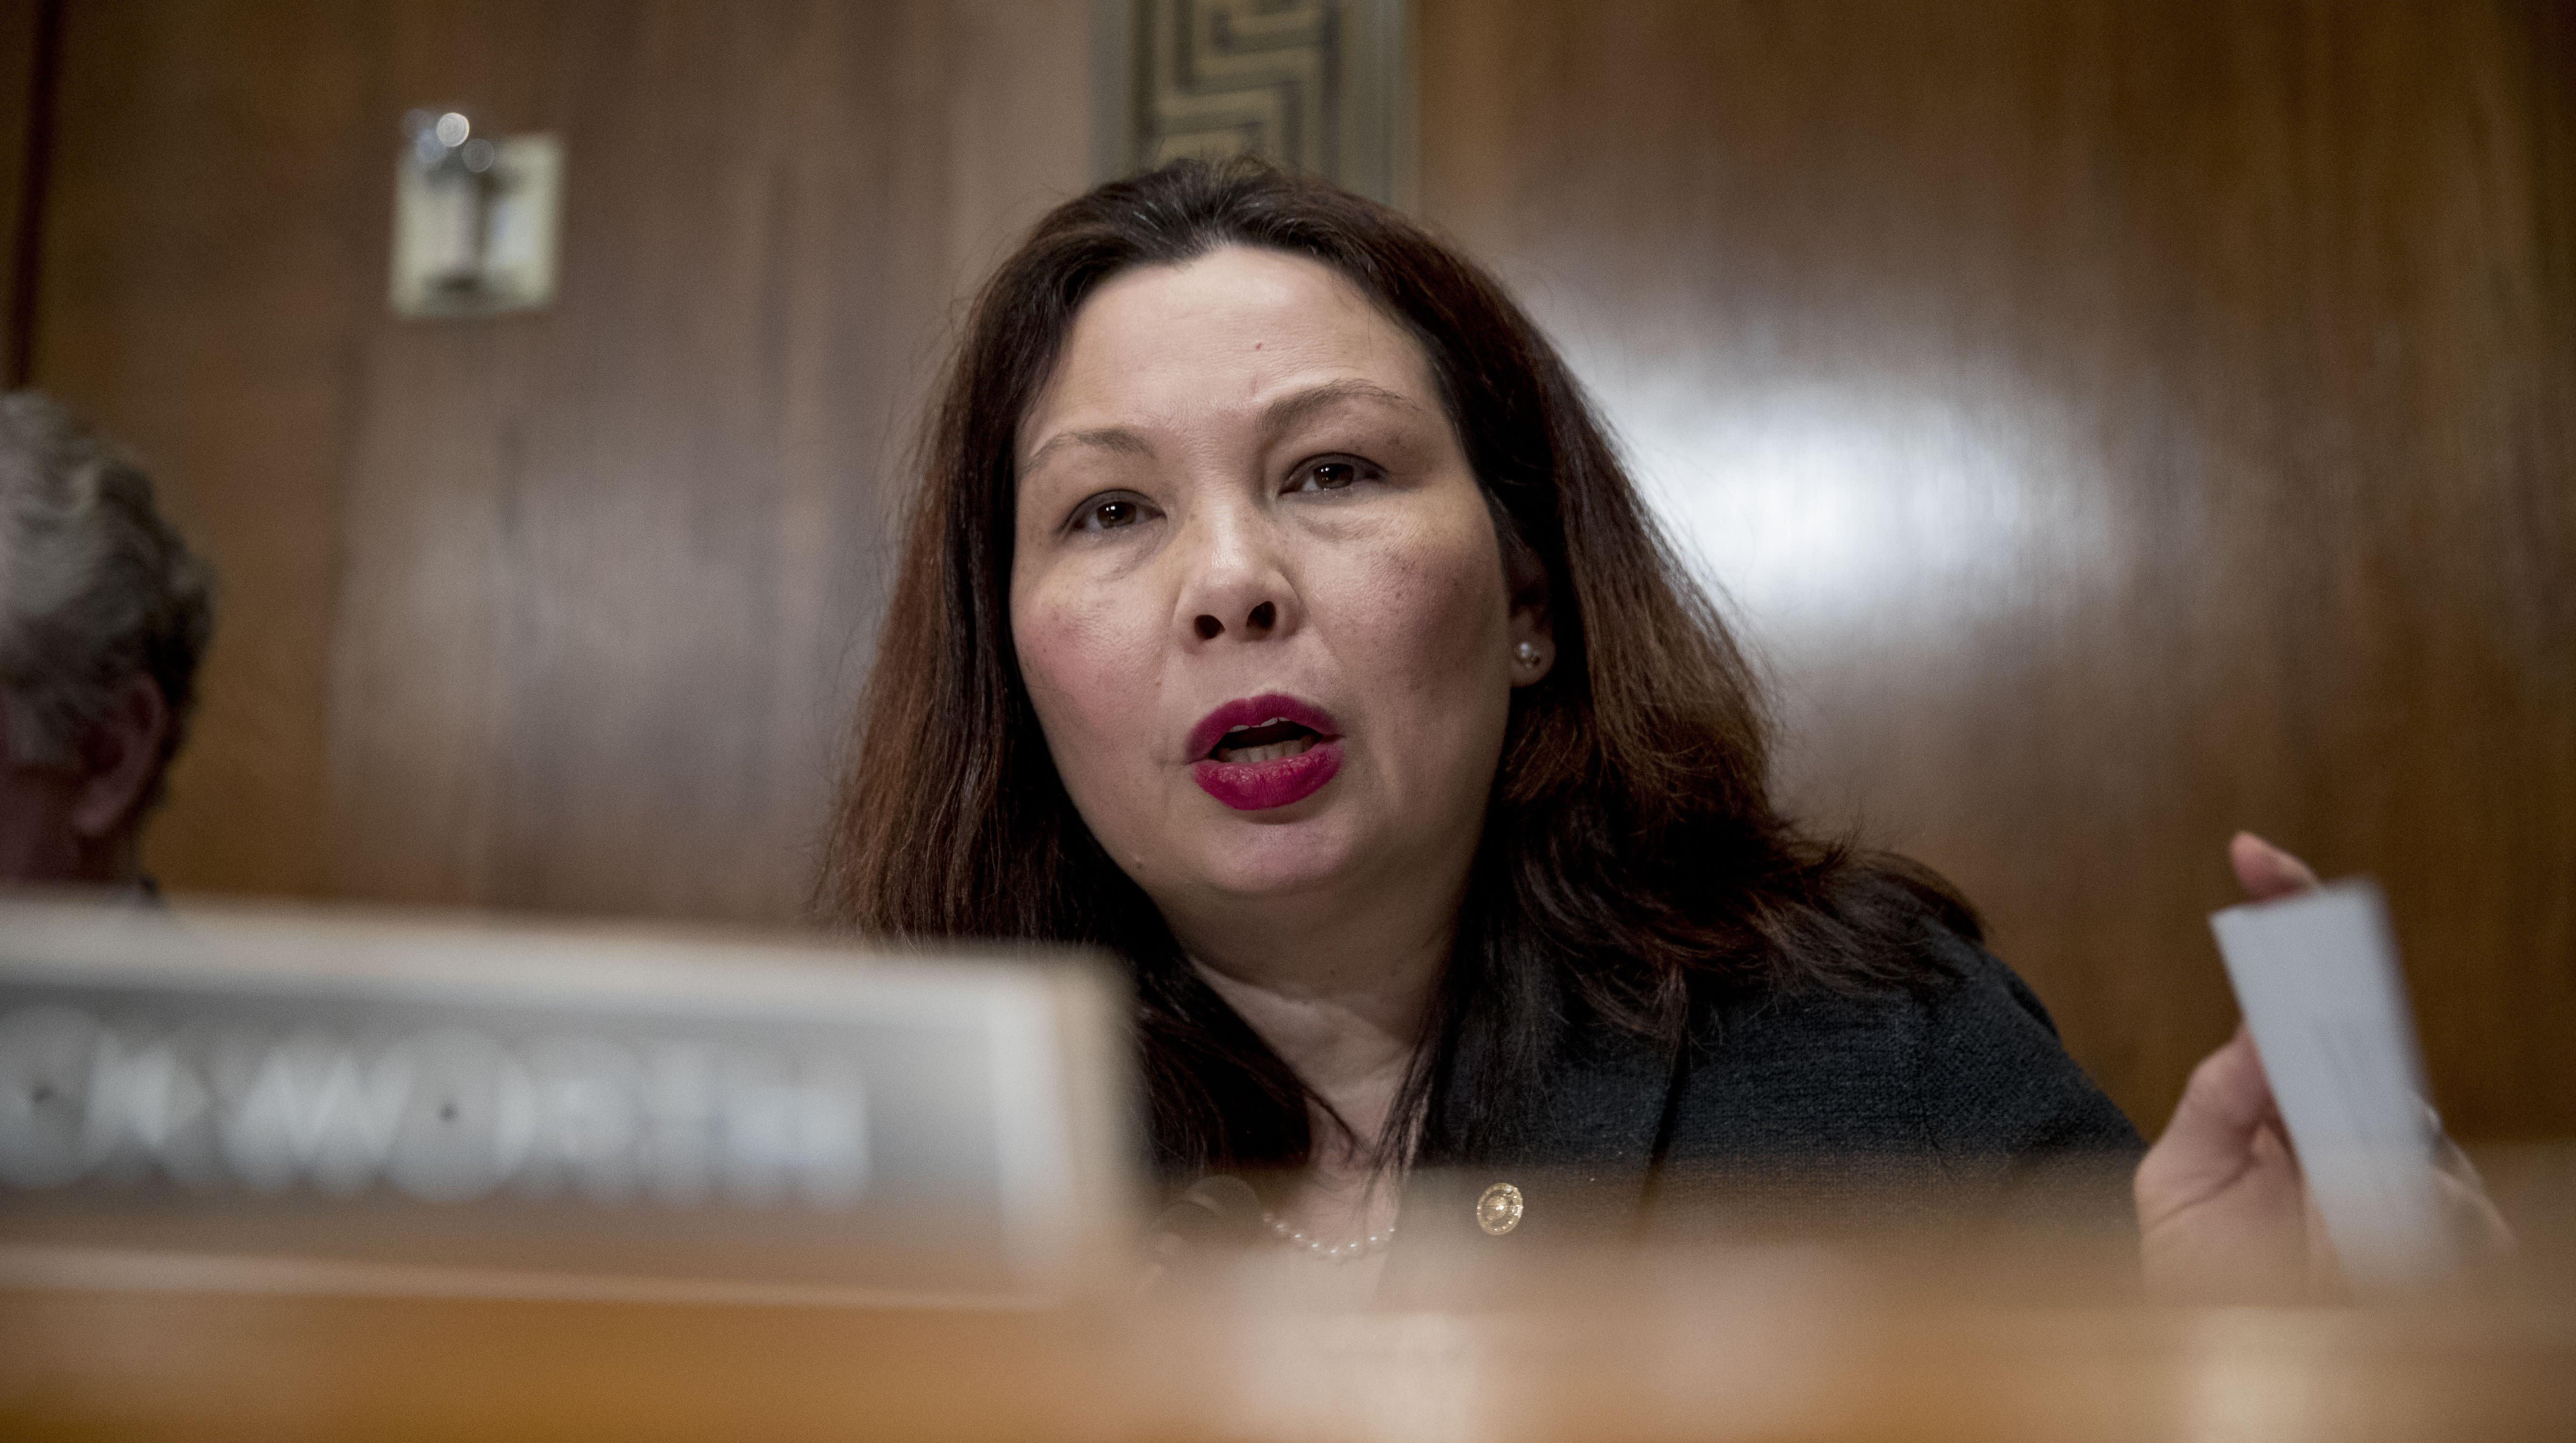 Senator Tammy Duckworth Slams Transgender Military Ban, Recalling Near-Death Experience